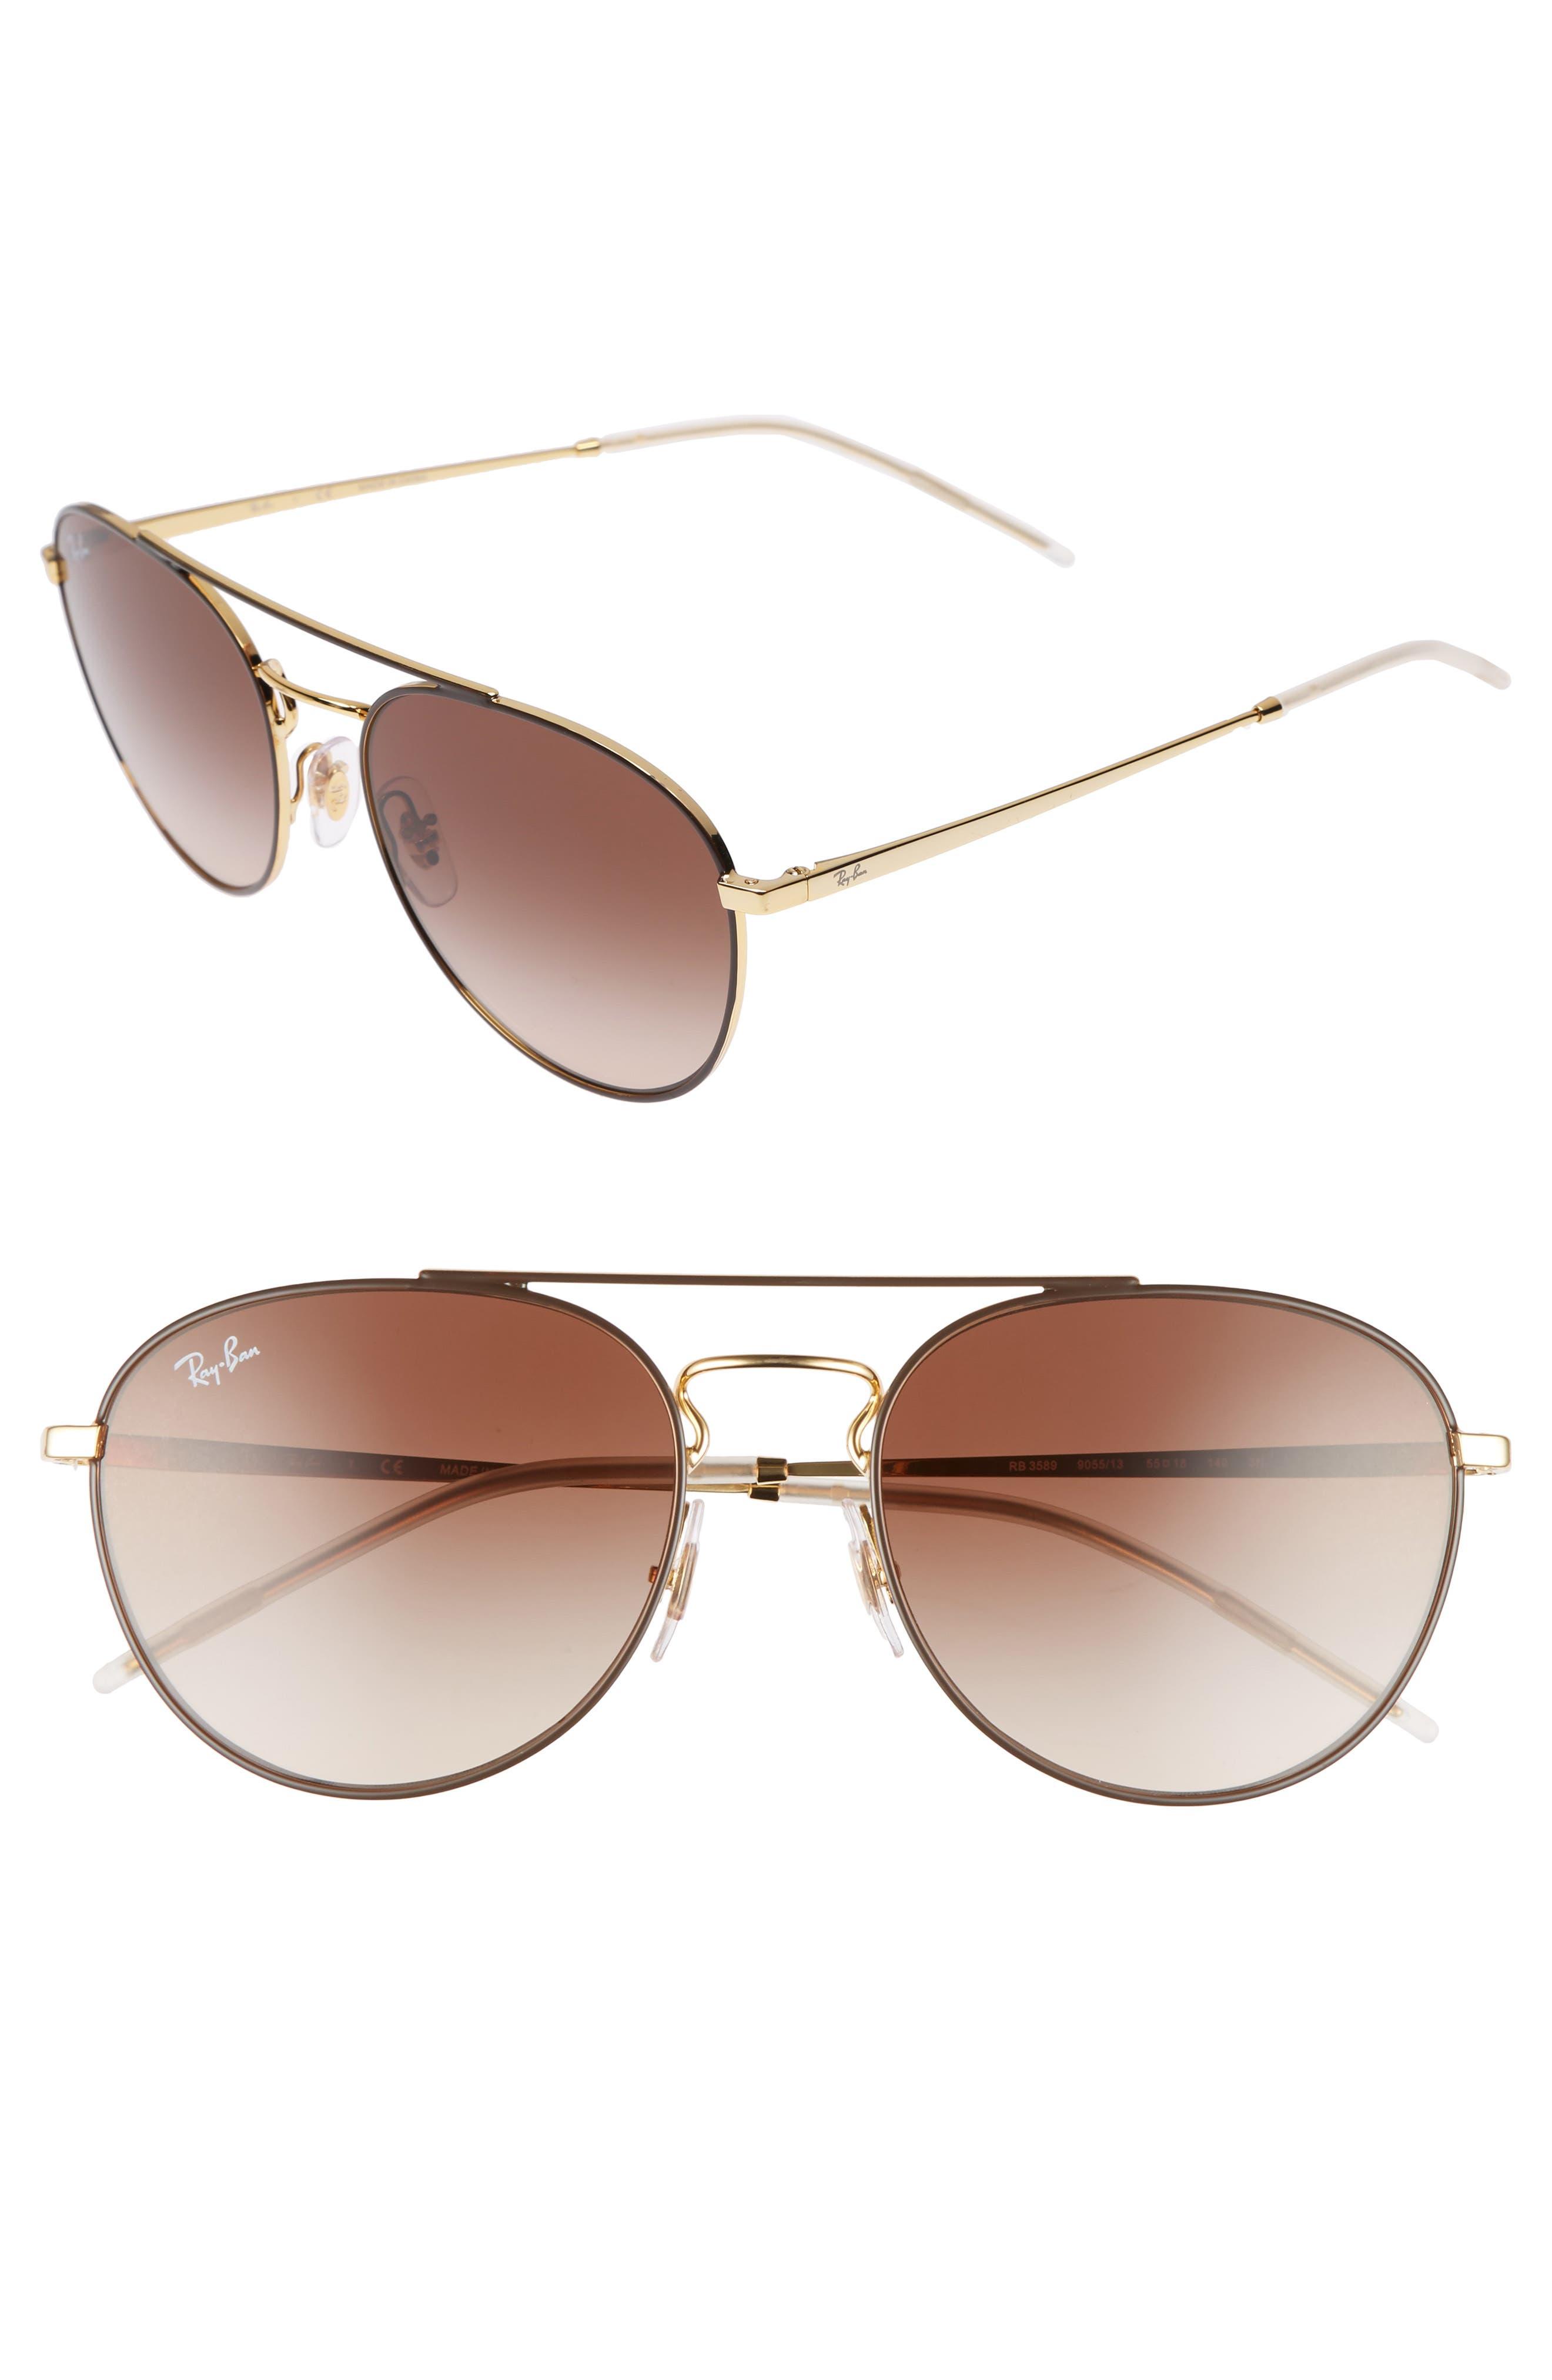 55mm Gradient Lens Round Aviator Sunglasses,                             Alternate thumbnail 5, color,